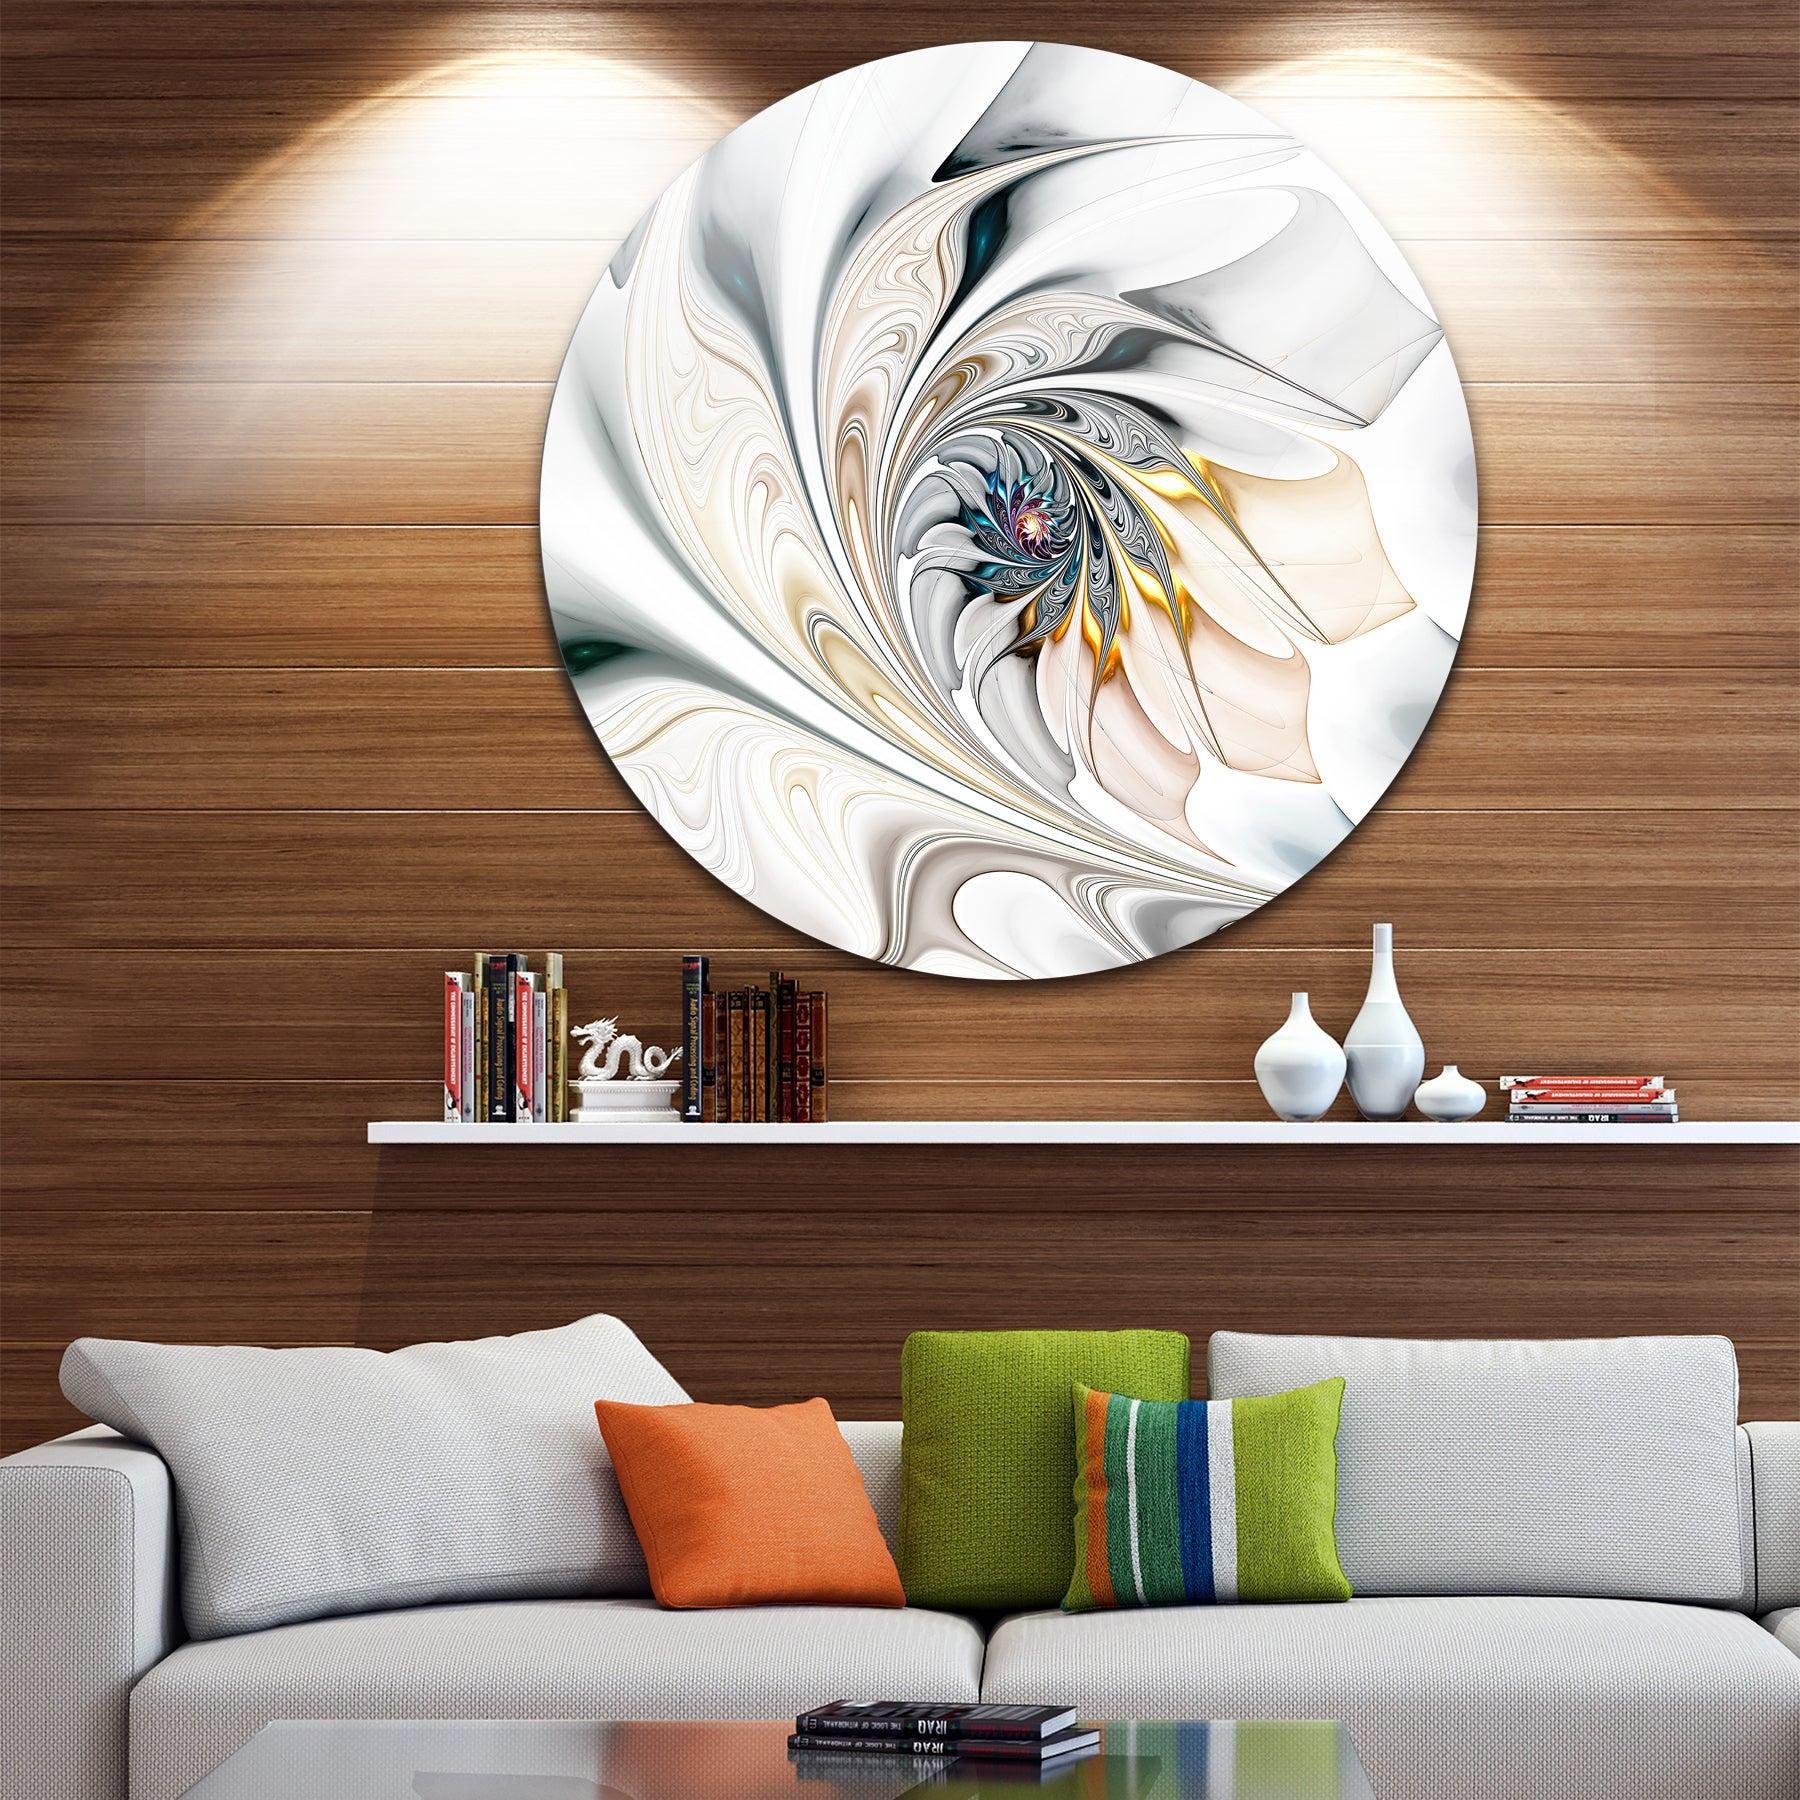 Floral Art Gallery   Shop Our Best Home Goods Deals Online Regarding 2 Piece Heart Shaped Fan Wall Decor Sets (View 23 of 30)